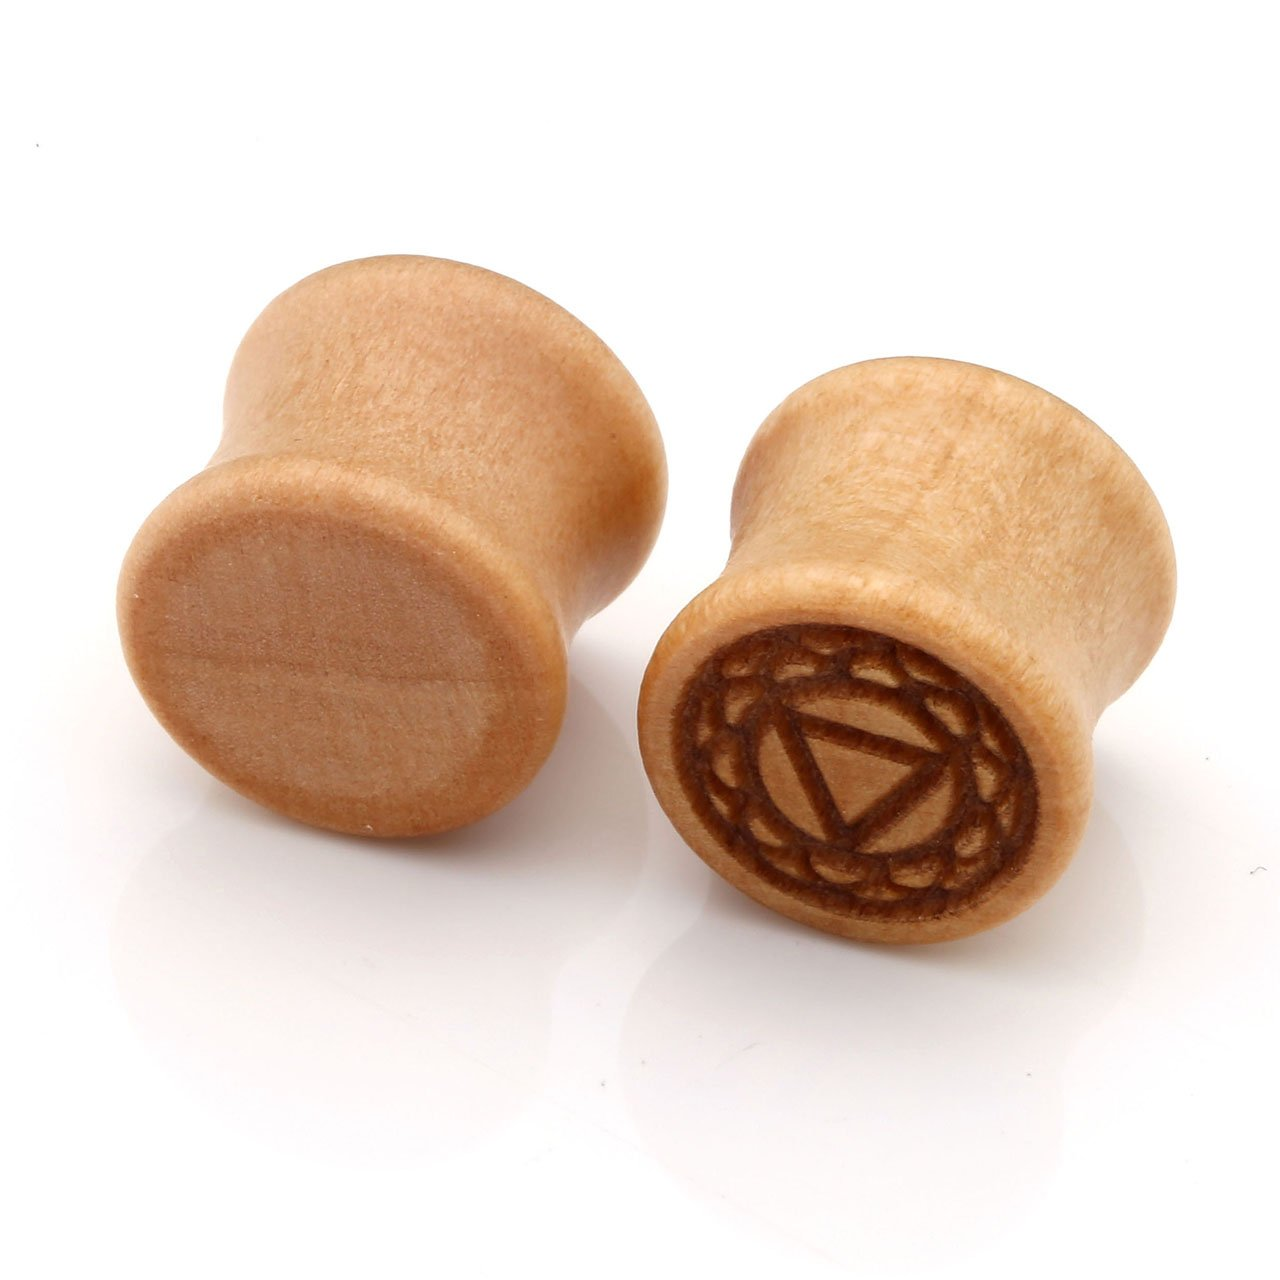 PiercingJ Organic Holz Chakra Plug Set 7 Paare 10-20mm Double Flared Sattel Tunnel Plugs Ohrstecker Ohrpiercing Sahasrara + Ajna + Vishuddha + Anahata + Manipura + Svadhishthana + Muladhara Chakra (Gauge: 10mm)